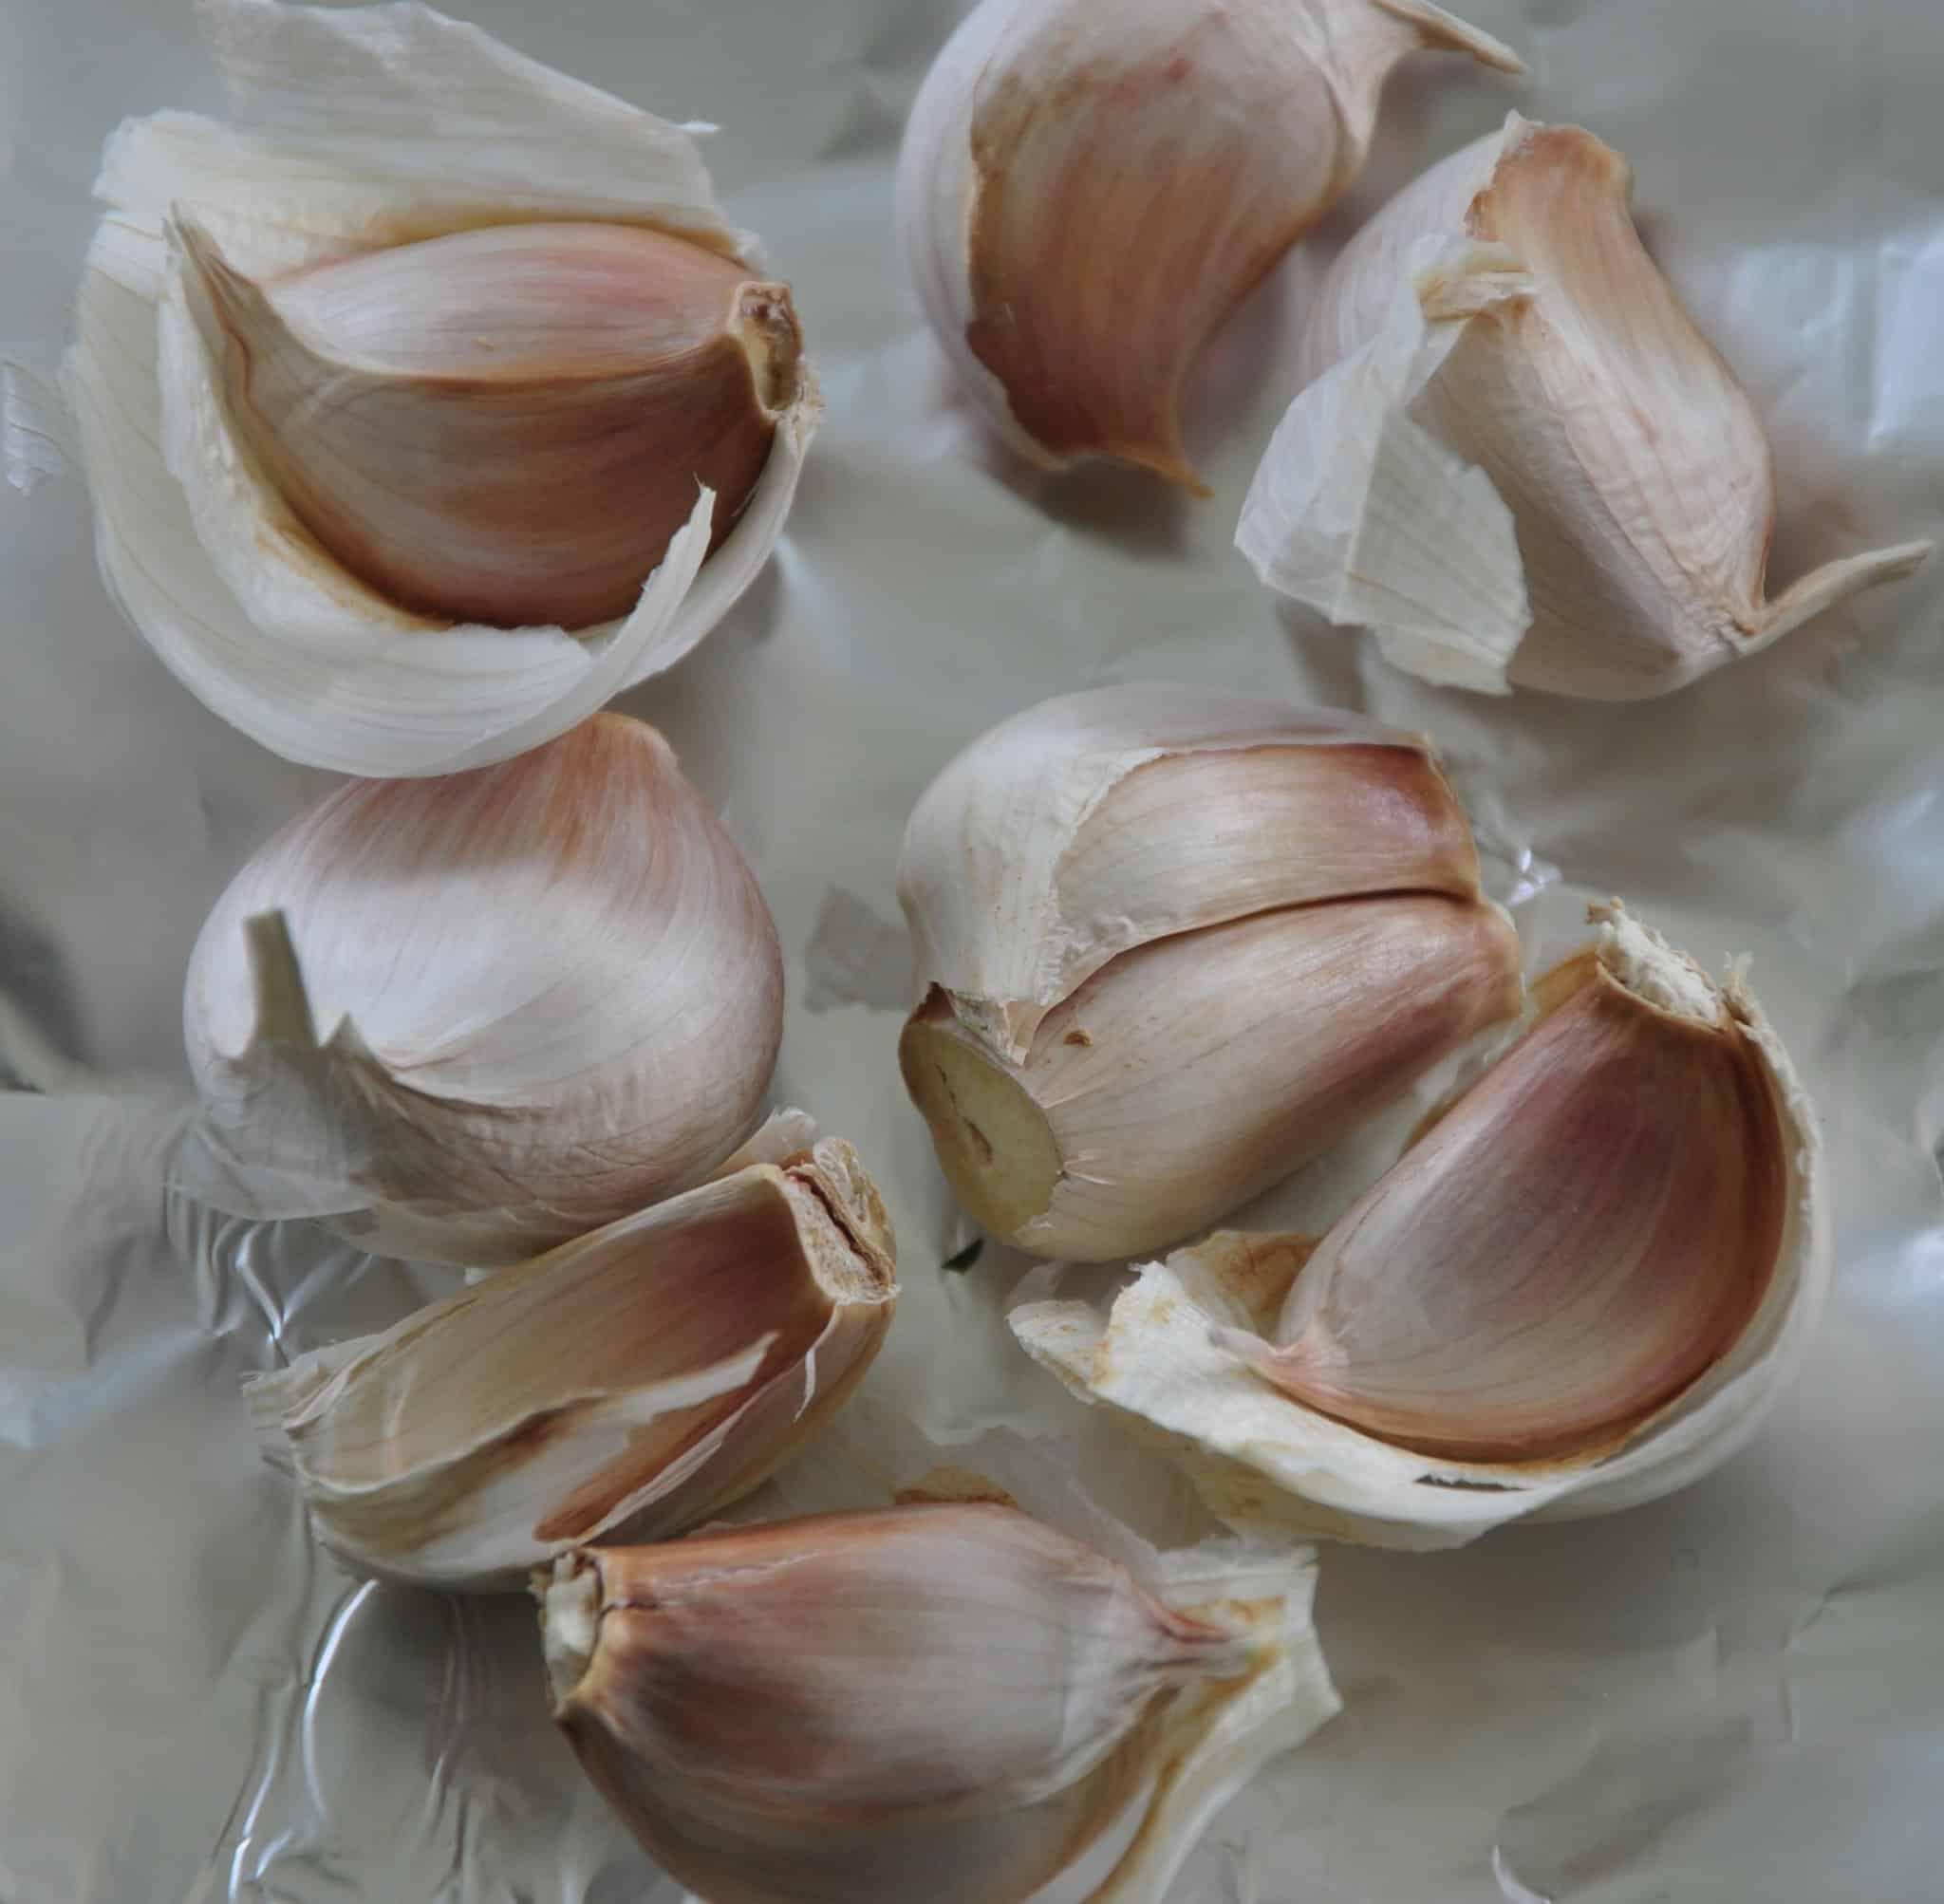 roasted garlic, anchovy and caper dressing fresh garlic on aluminium foil